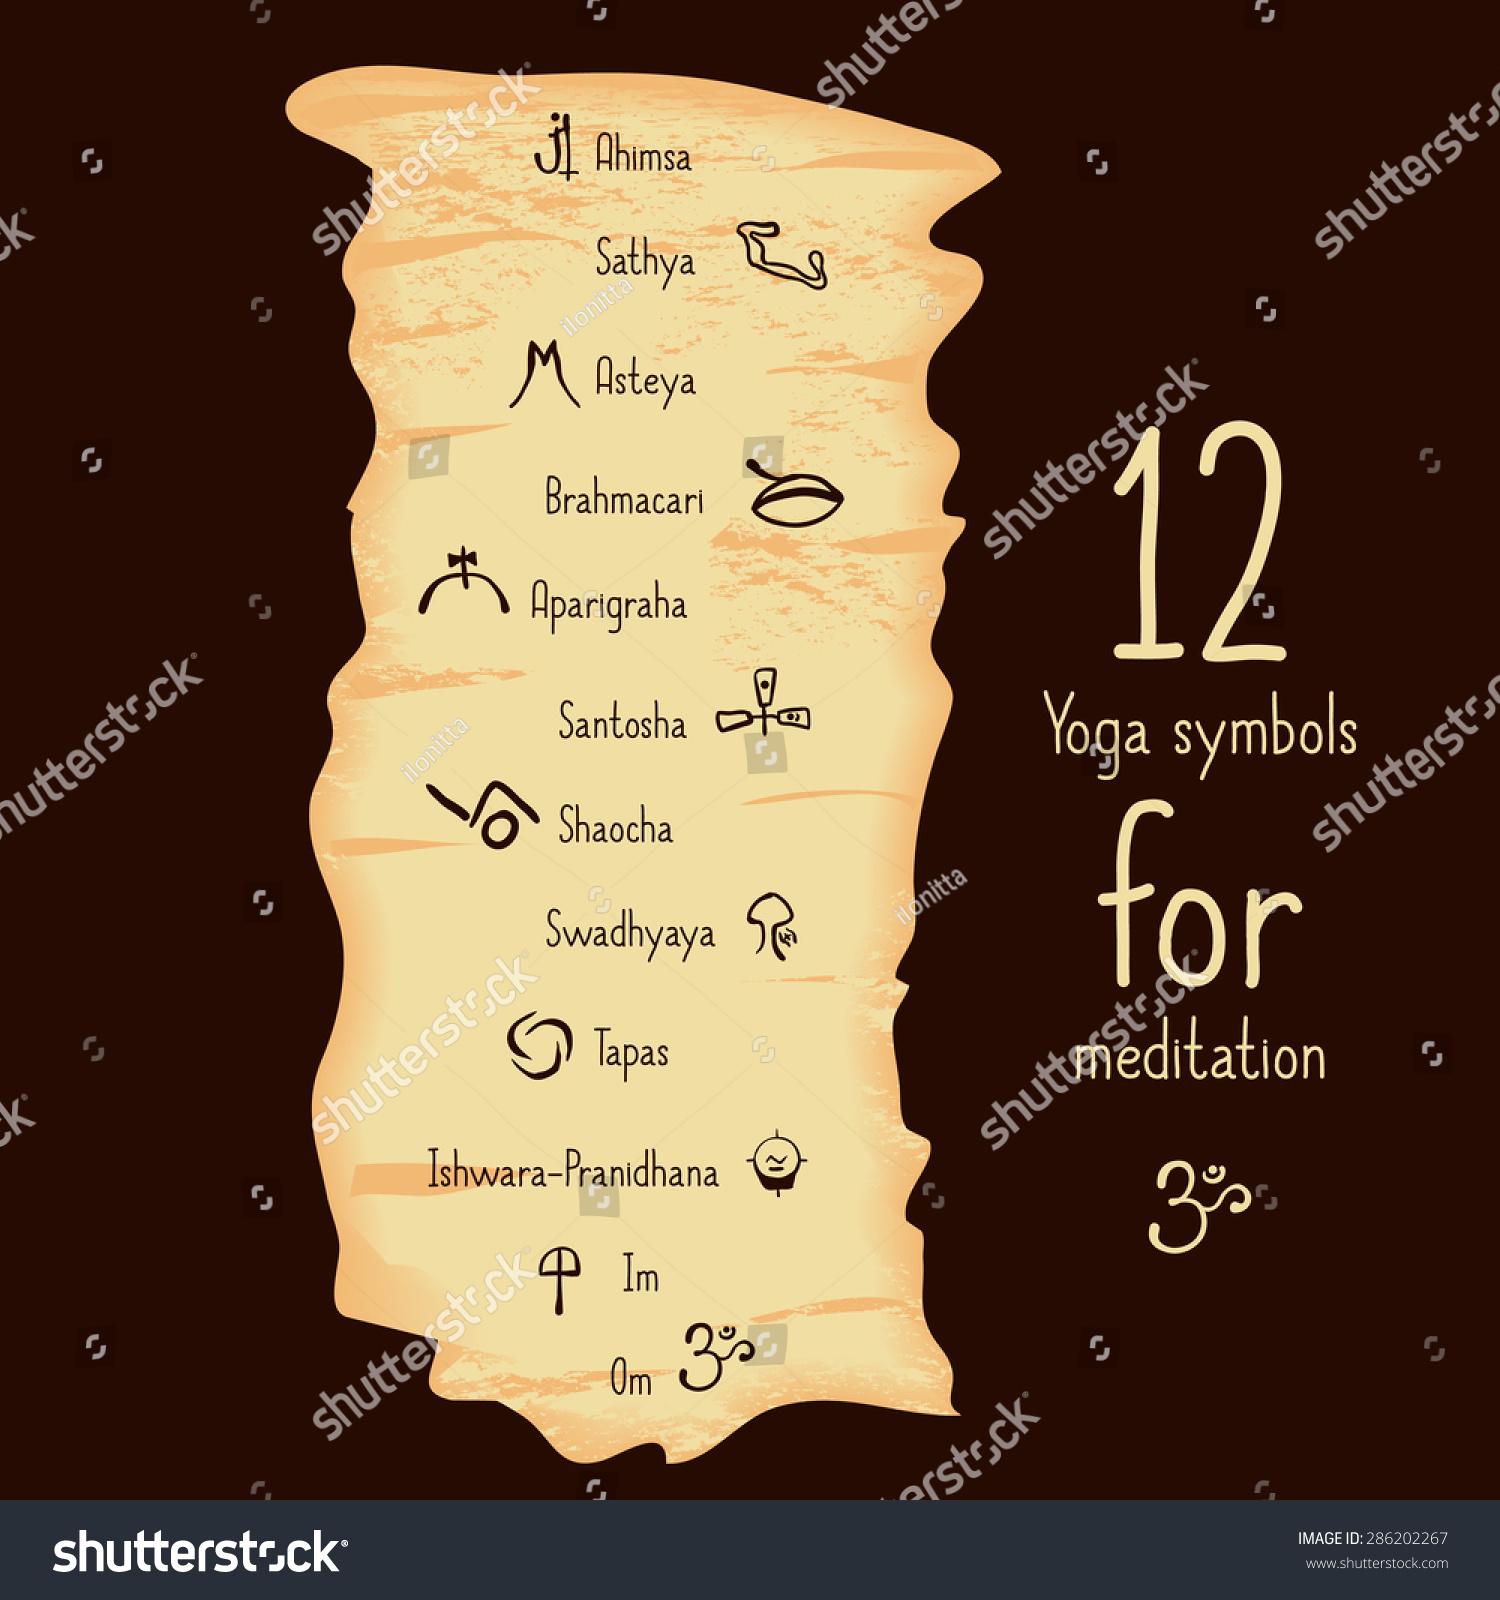 Yoga Poster Design Hatha Kunta 12 Stock Vector 286202267 ...